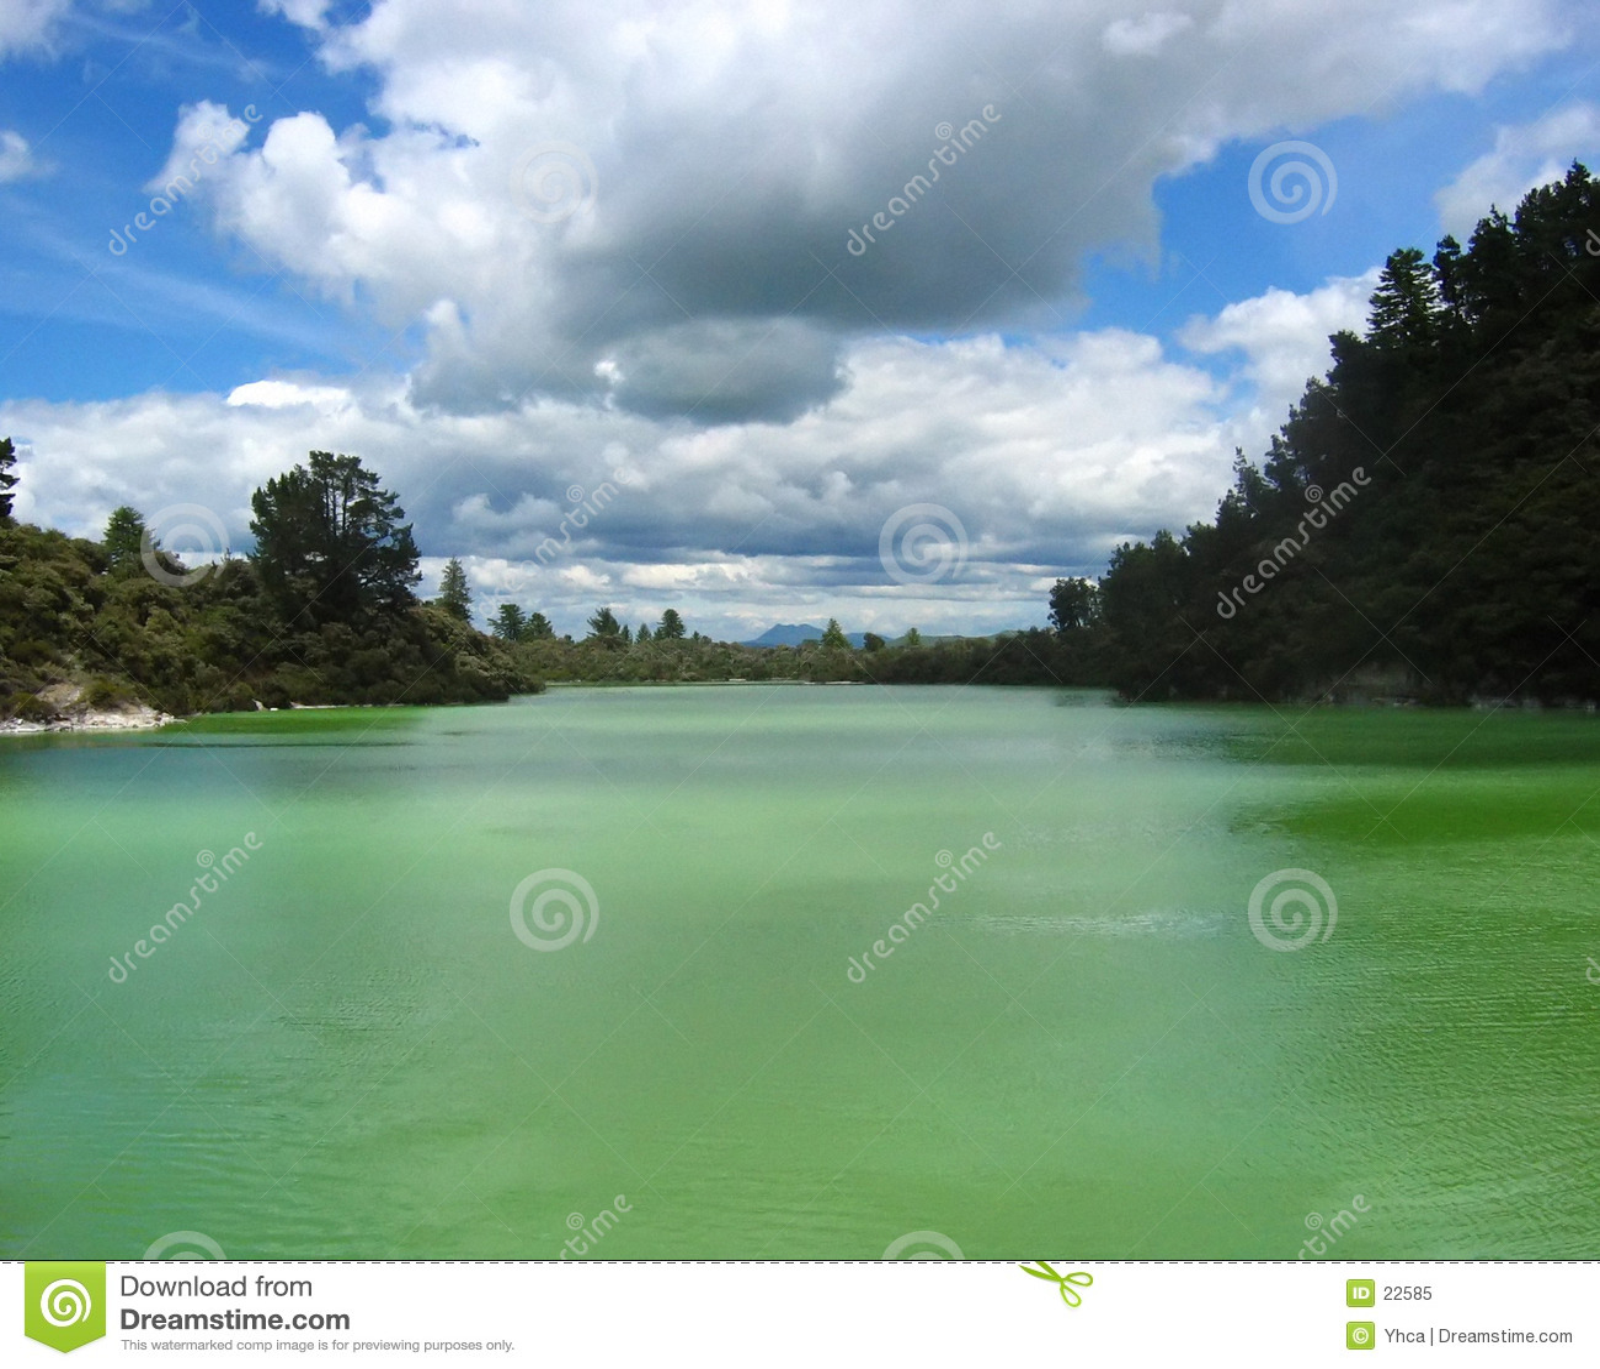 Solfori il lago a Rotorua, NZ.